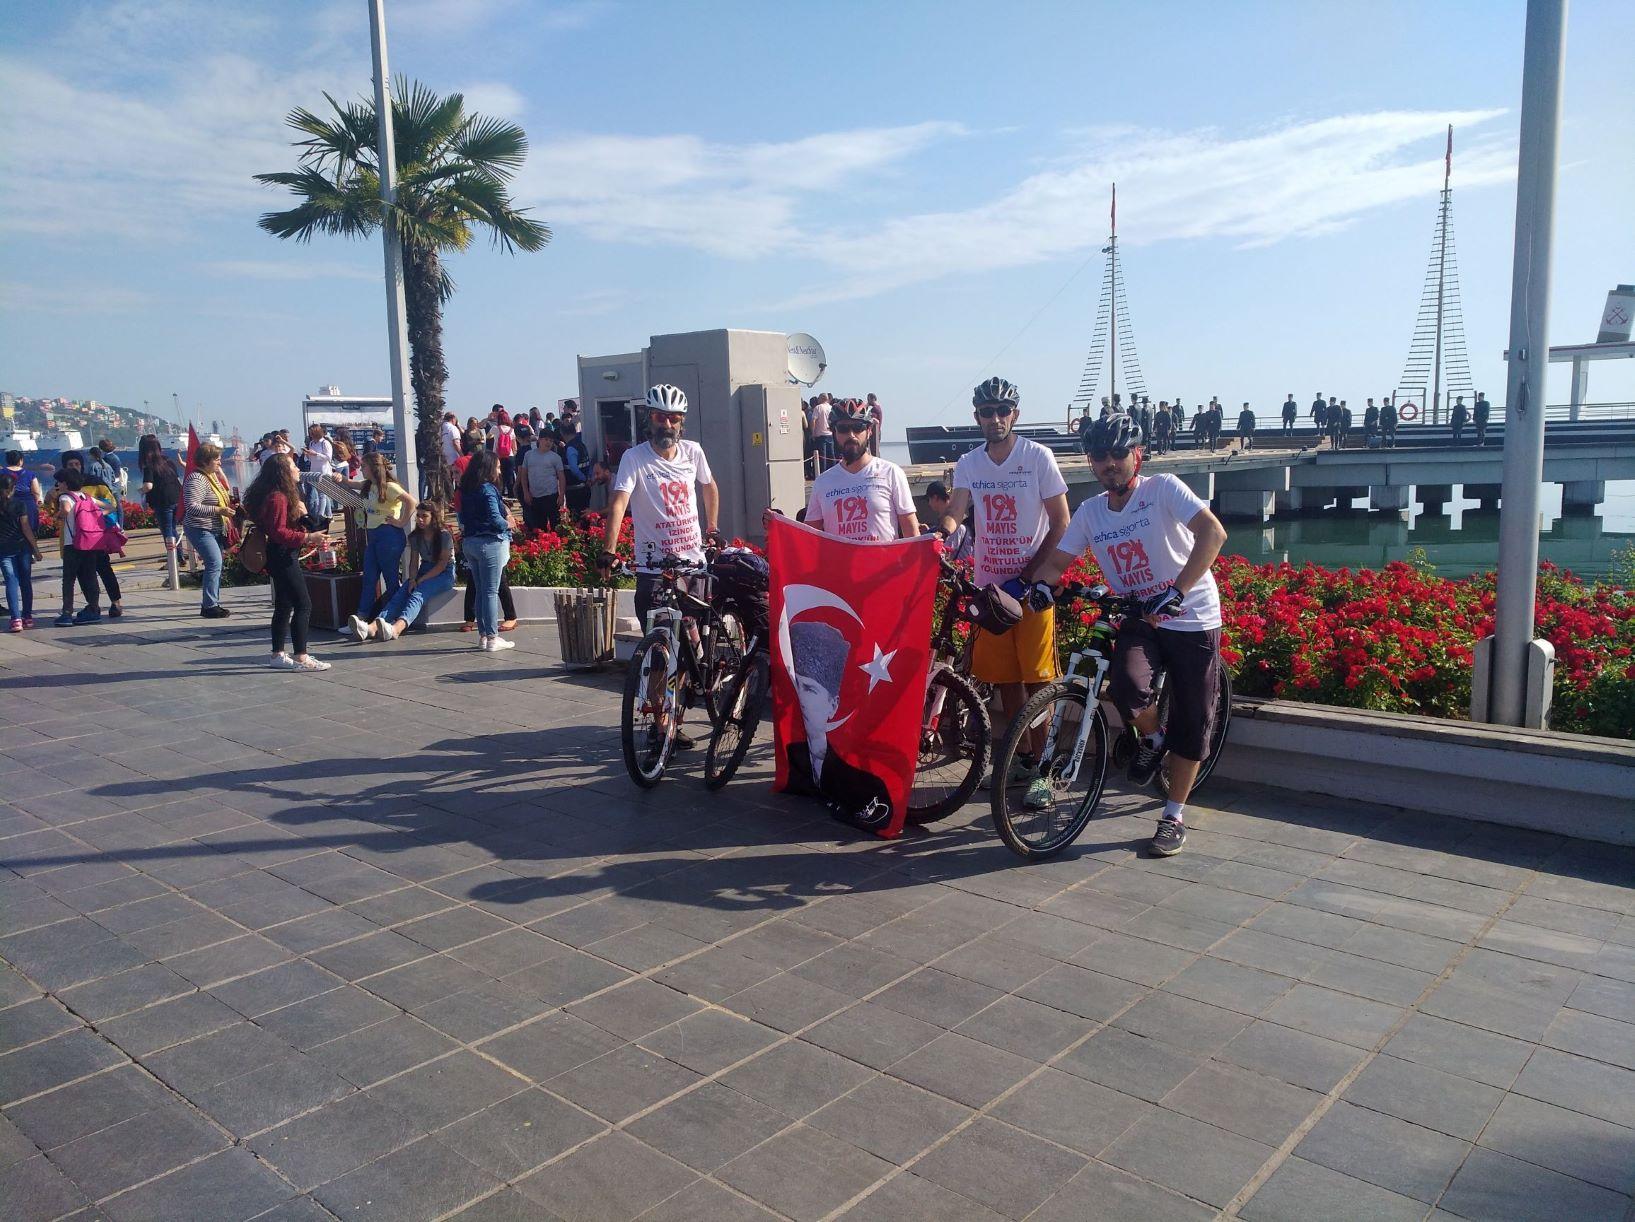 kurtulus-yolu-samsun-amasya-bisiklet-rotasi-1